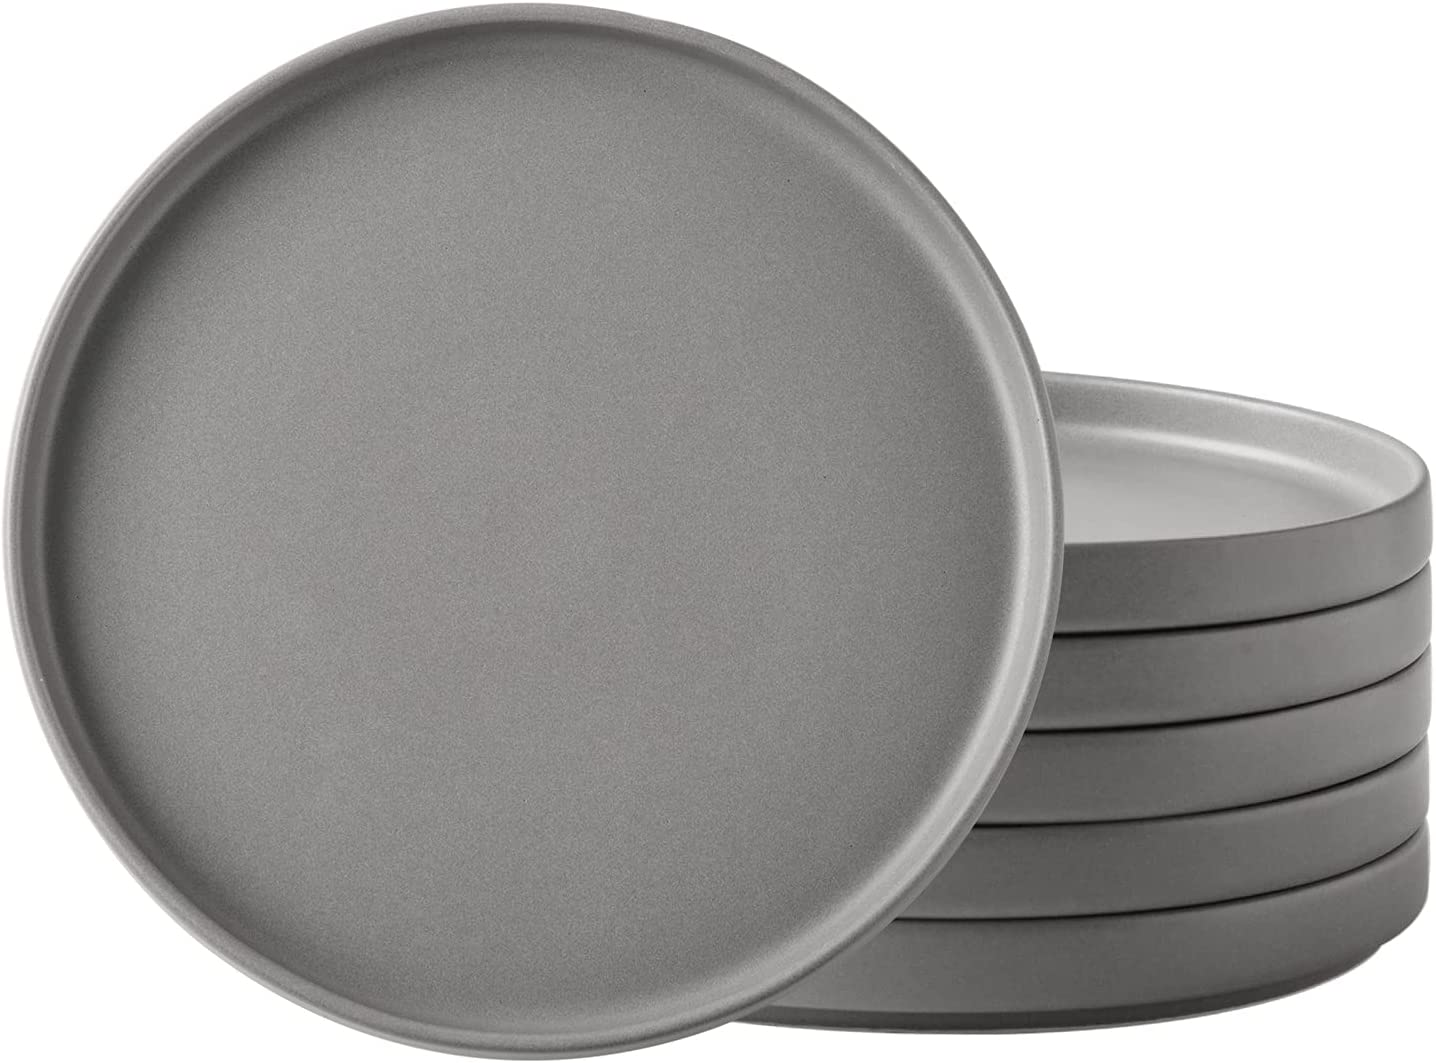 AmorArc Ceramic Salad Plates Set Quality Luxury inspection Of set dishes Desert Inch 8 6